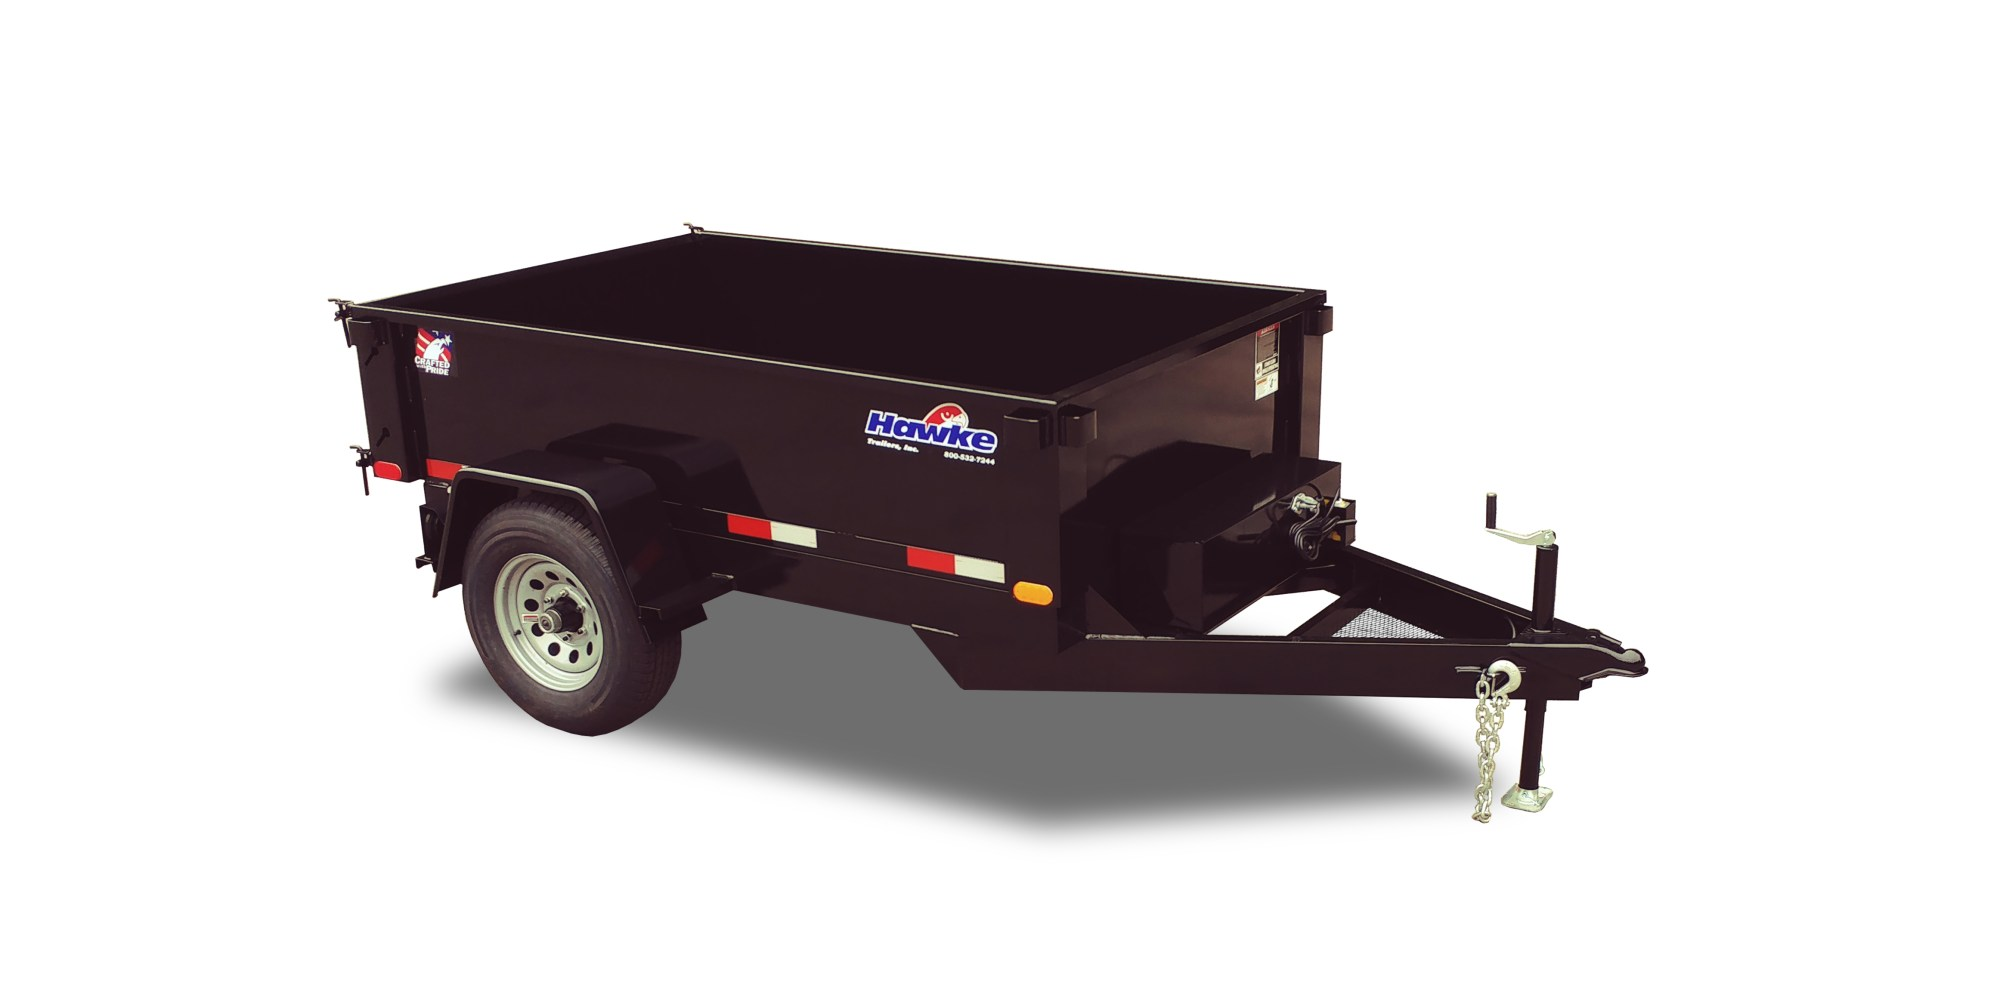 hight resolution of trailers hawke deckover dump trailers power tilt trailers